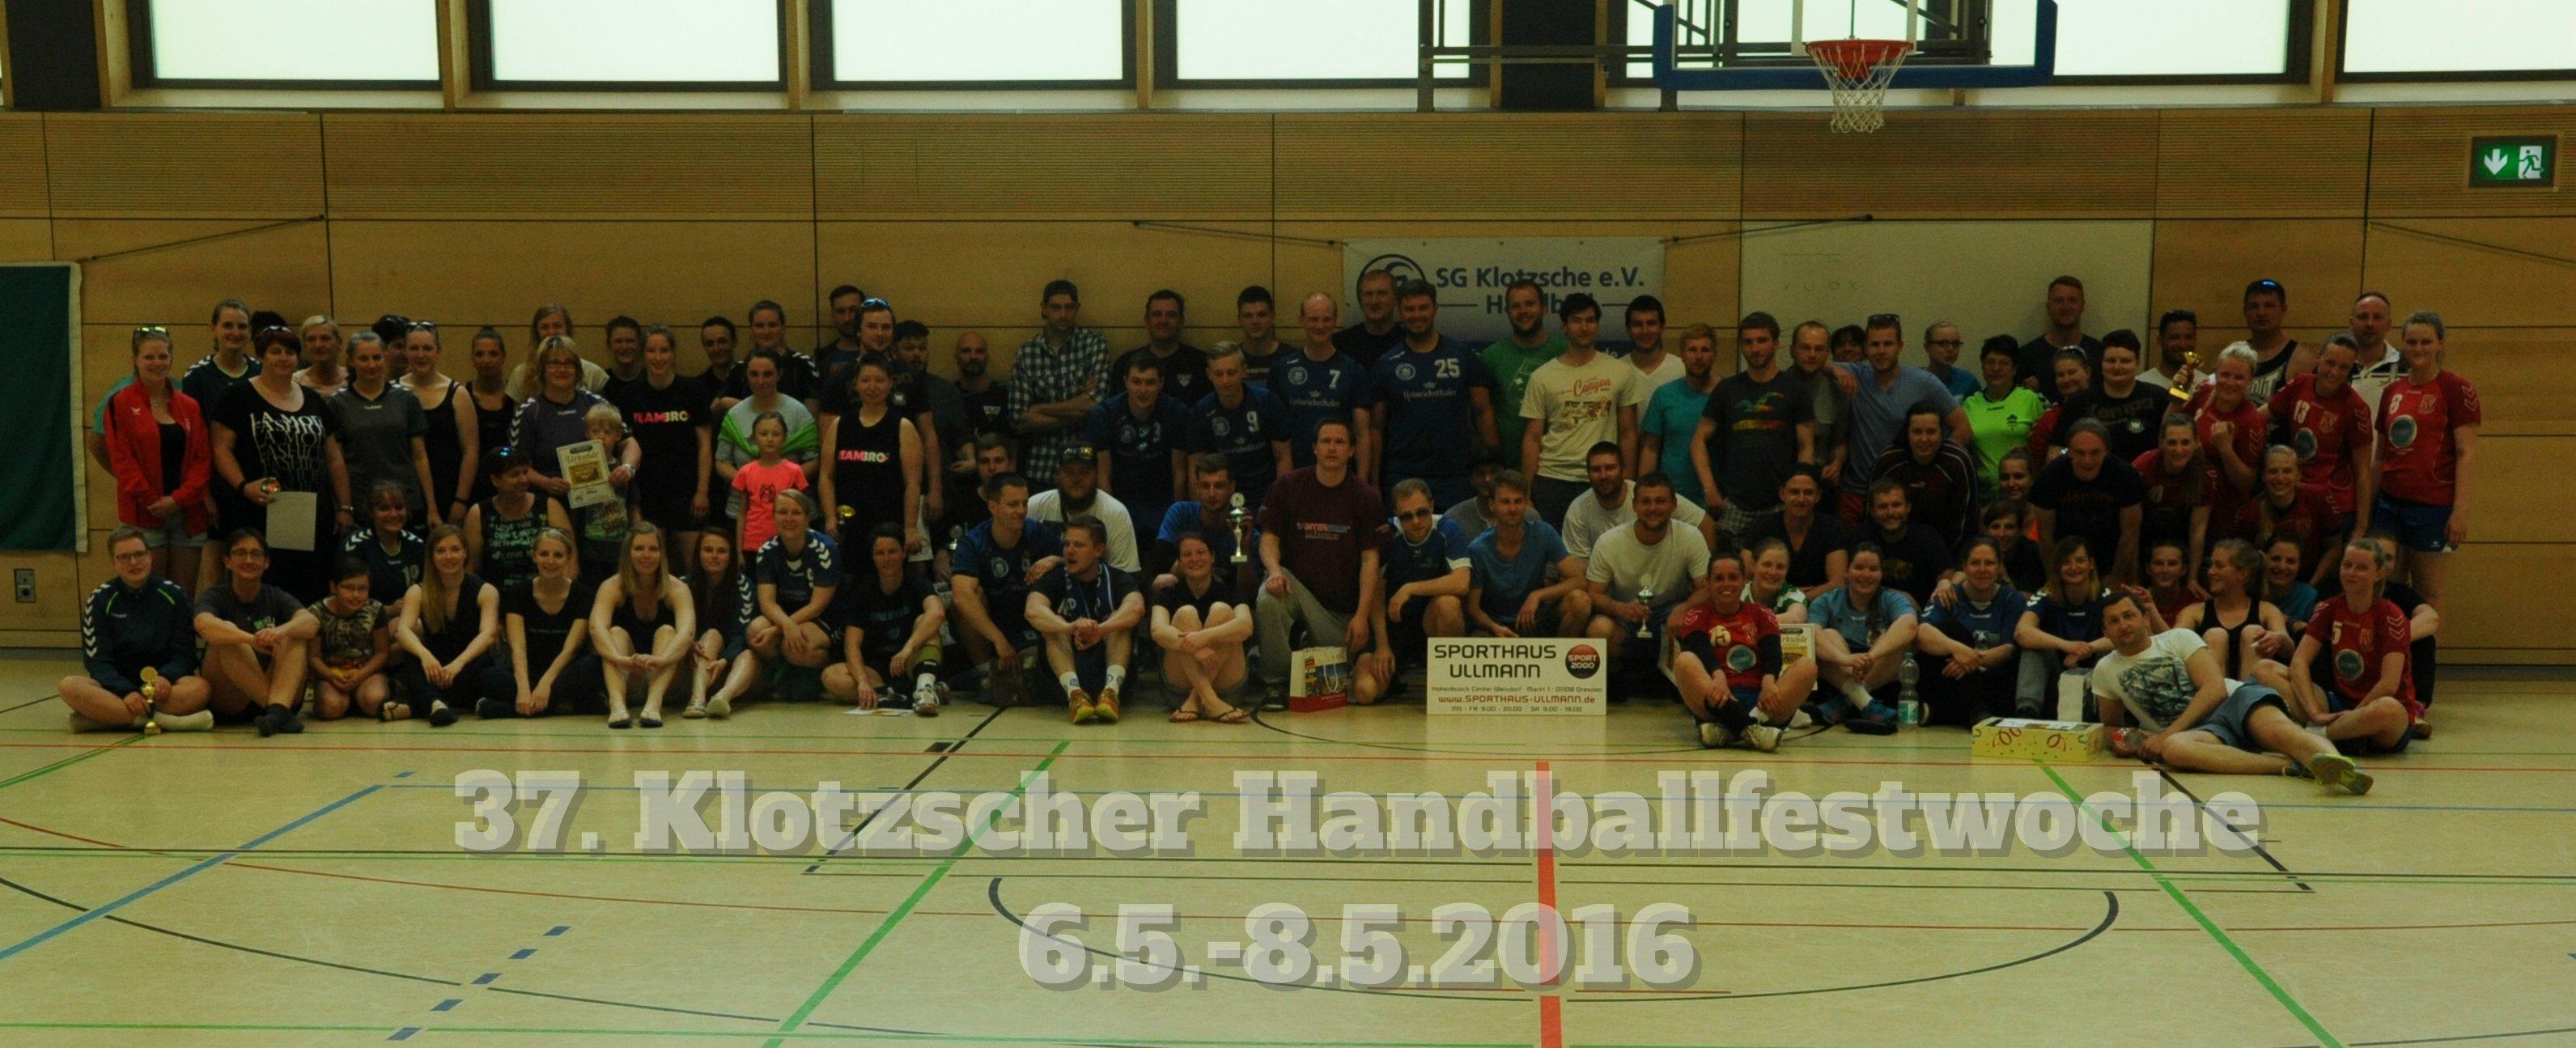 37. Klotzscher Handballfestwoche